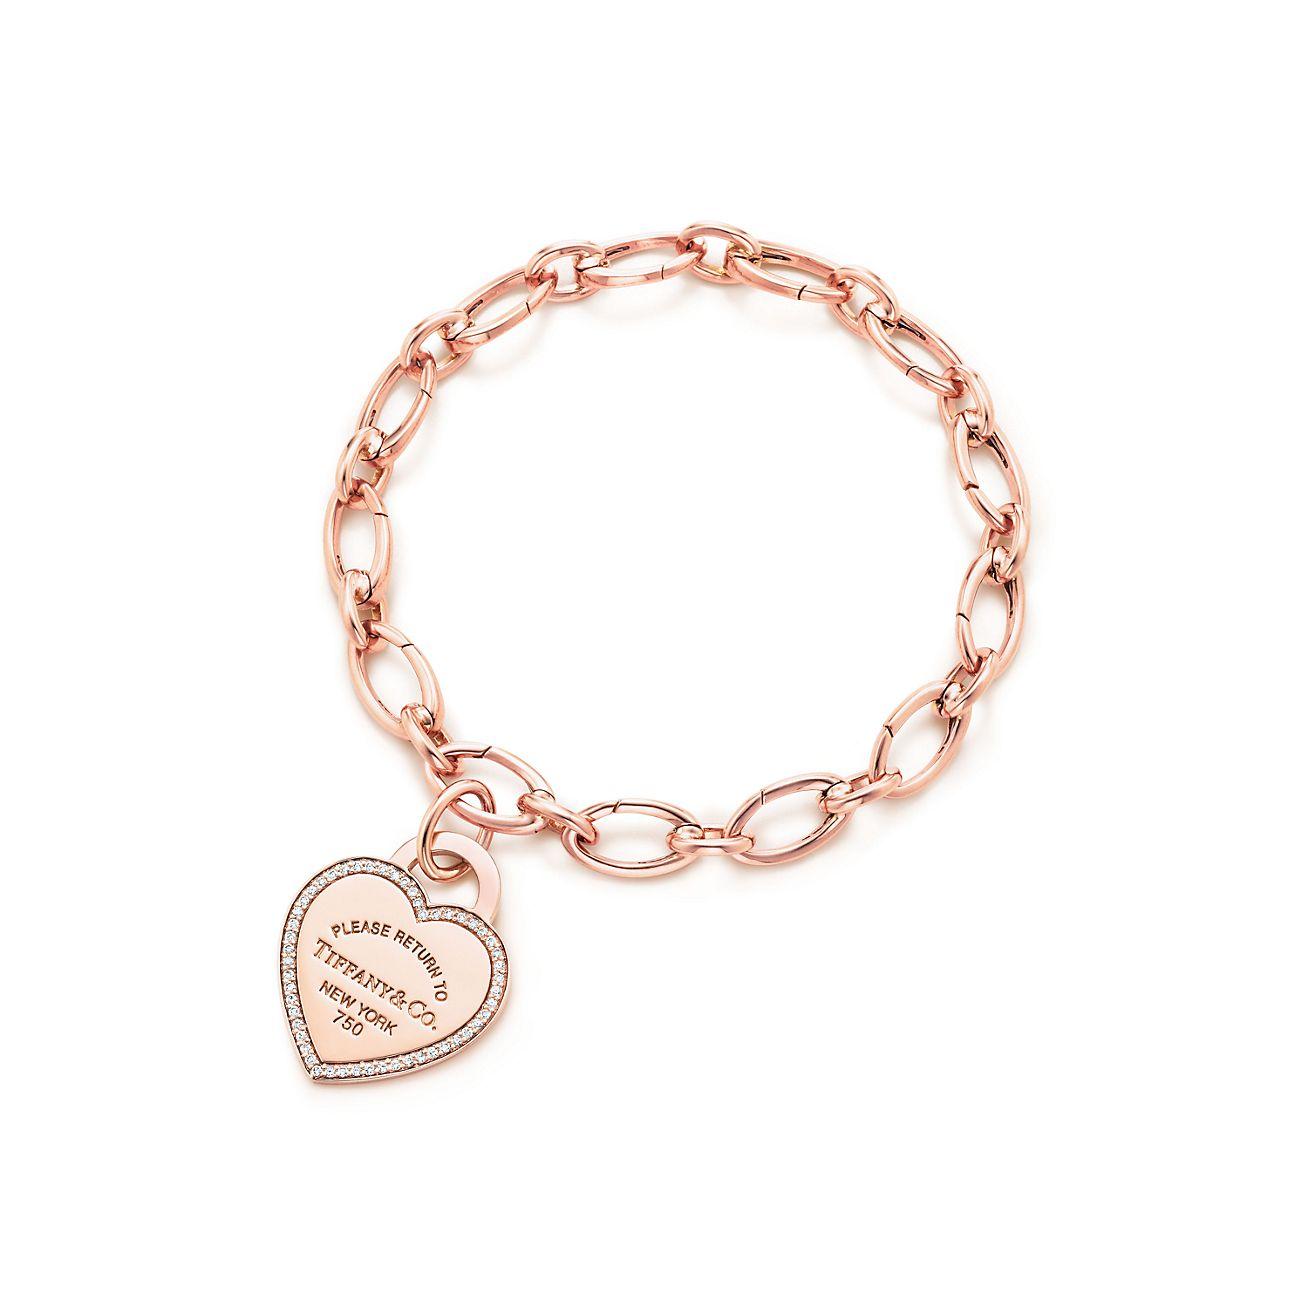 Return To Tiffany Heart Tag Charm And Bracelet